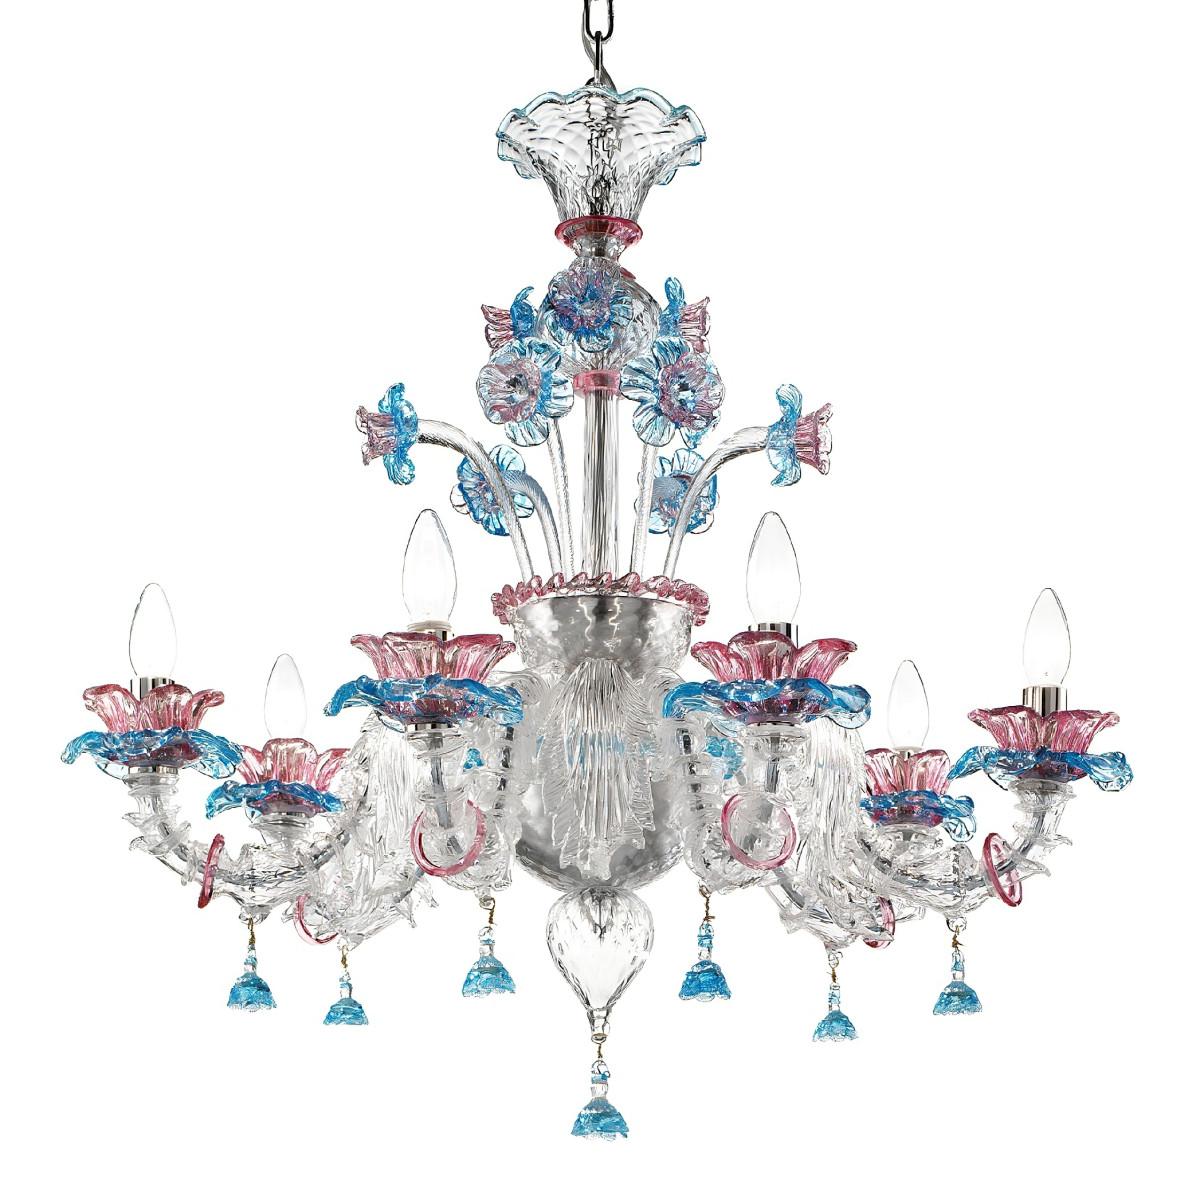 """Nada"" lampara de araña de Murano - 6 luces - transparente rosa y azul"